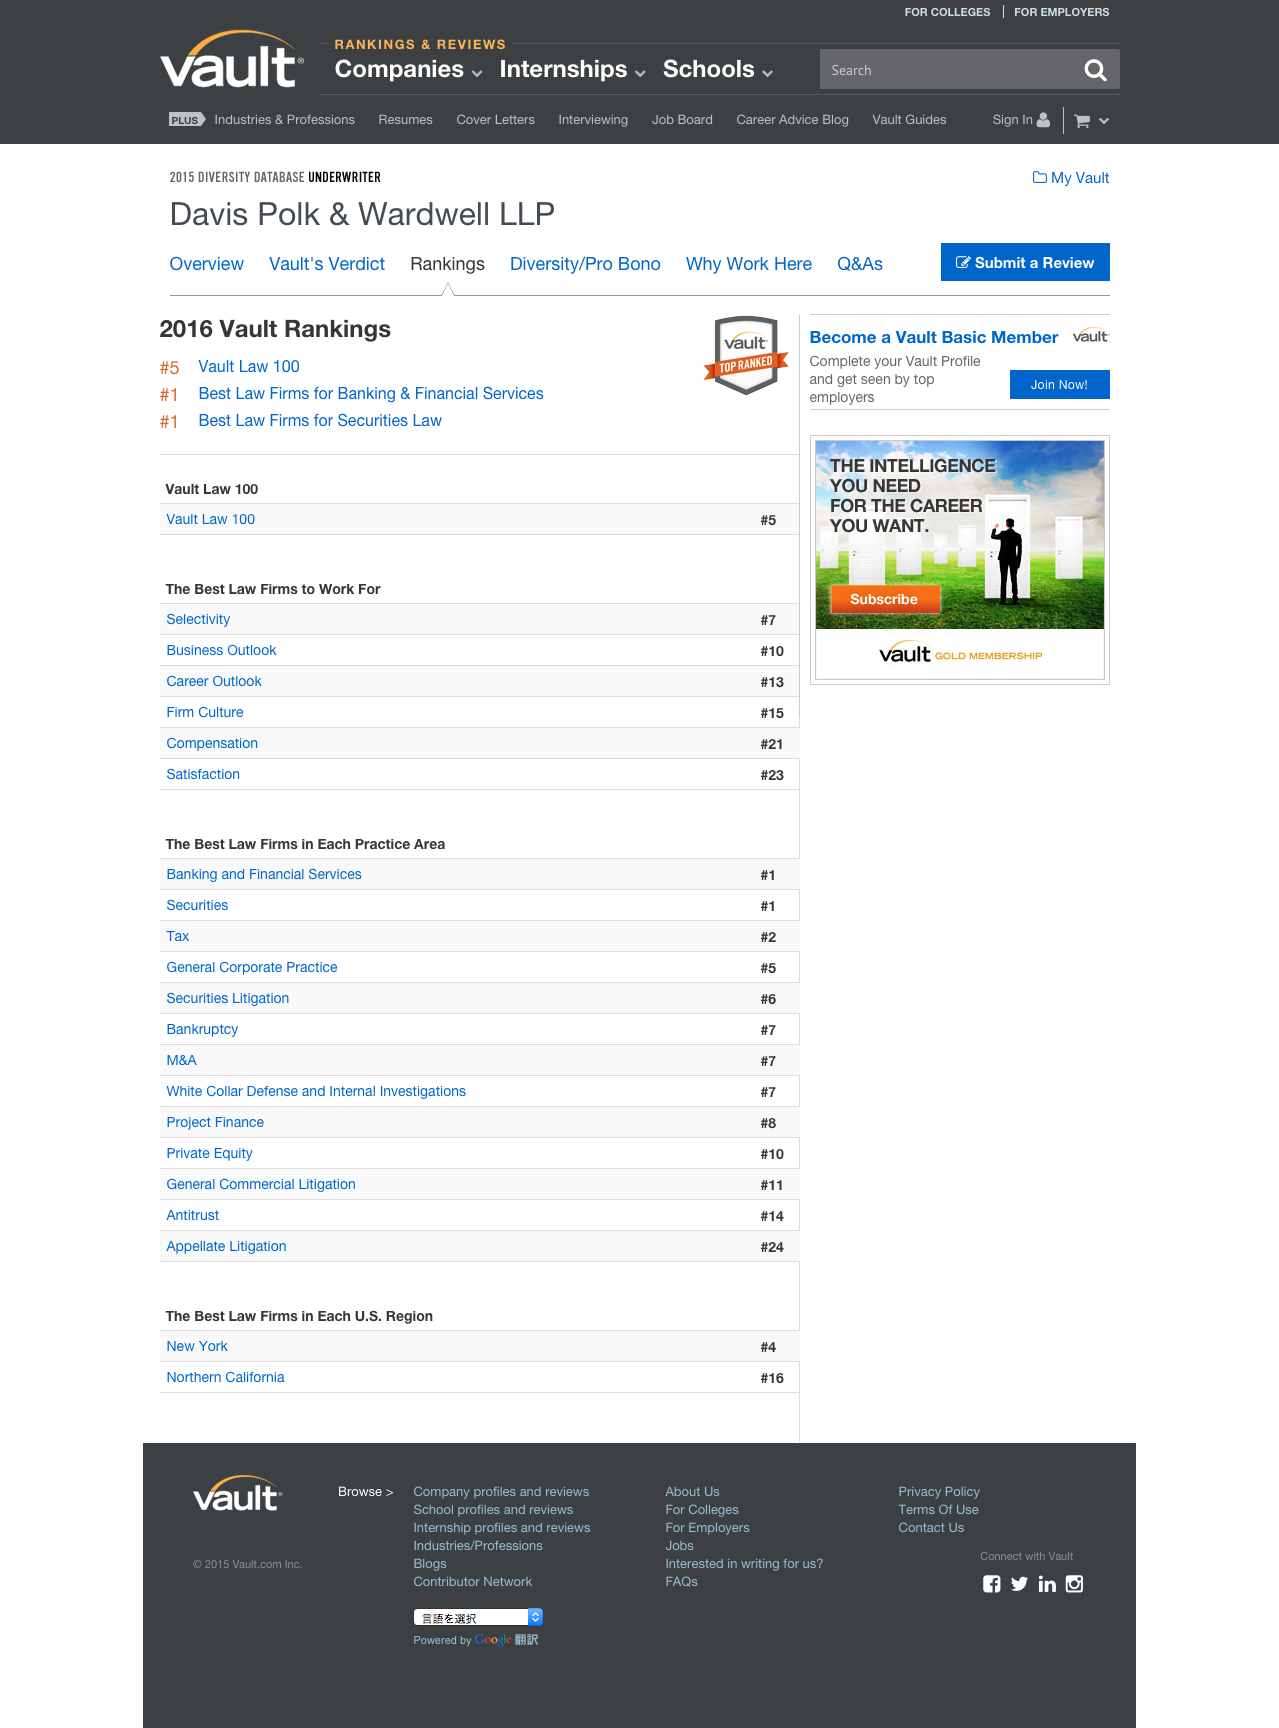 Davis Polk Vault 2016 Ranking